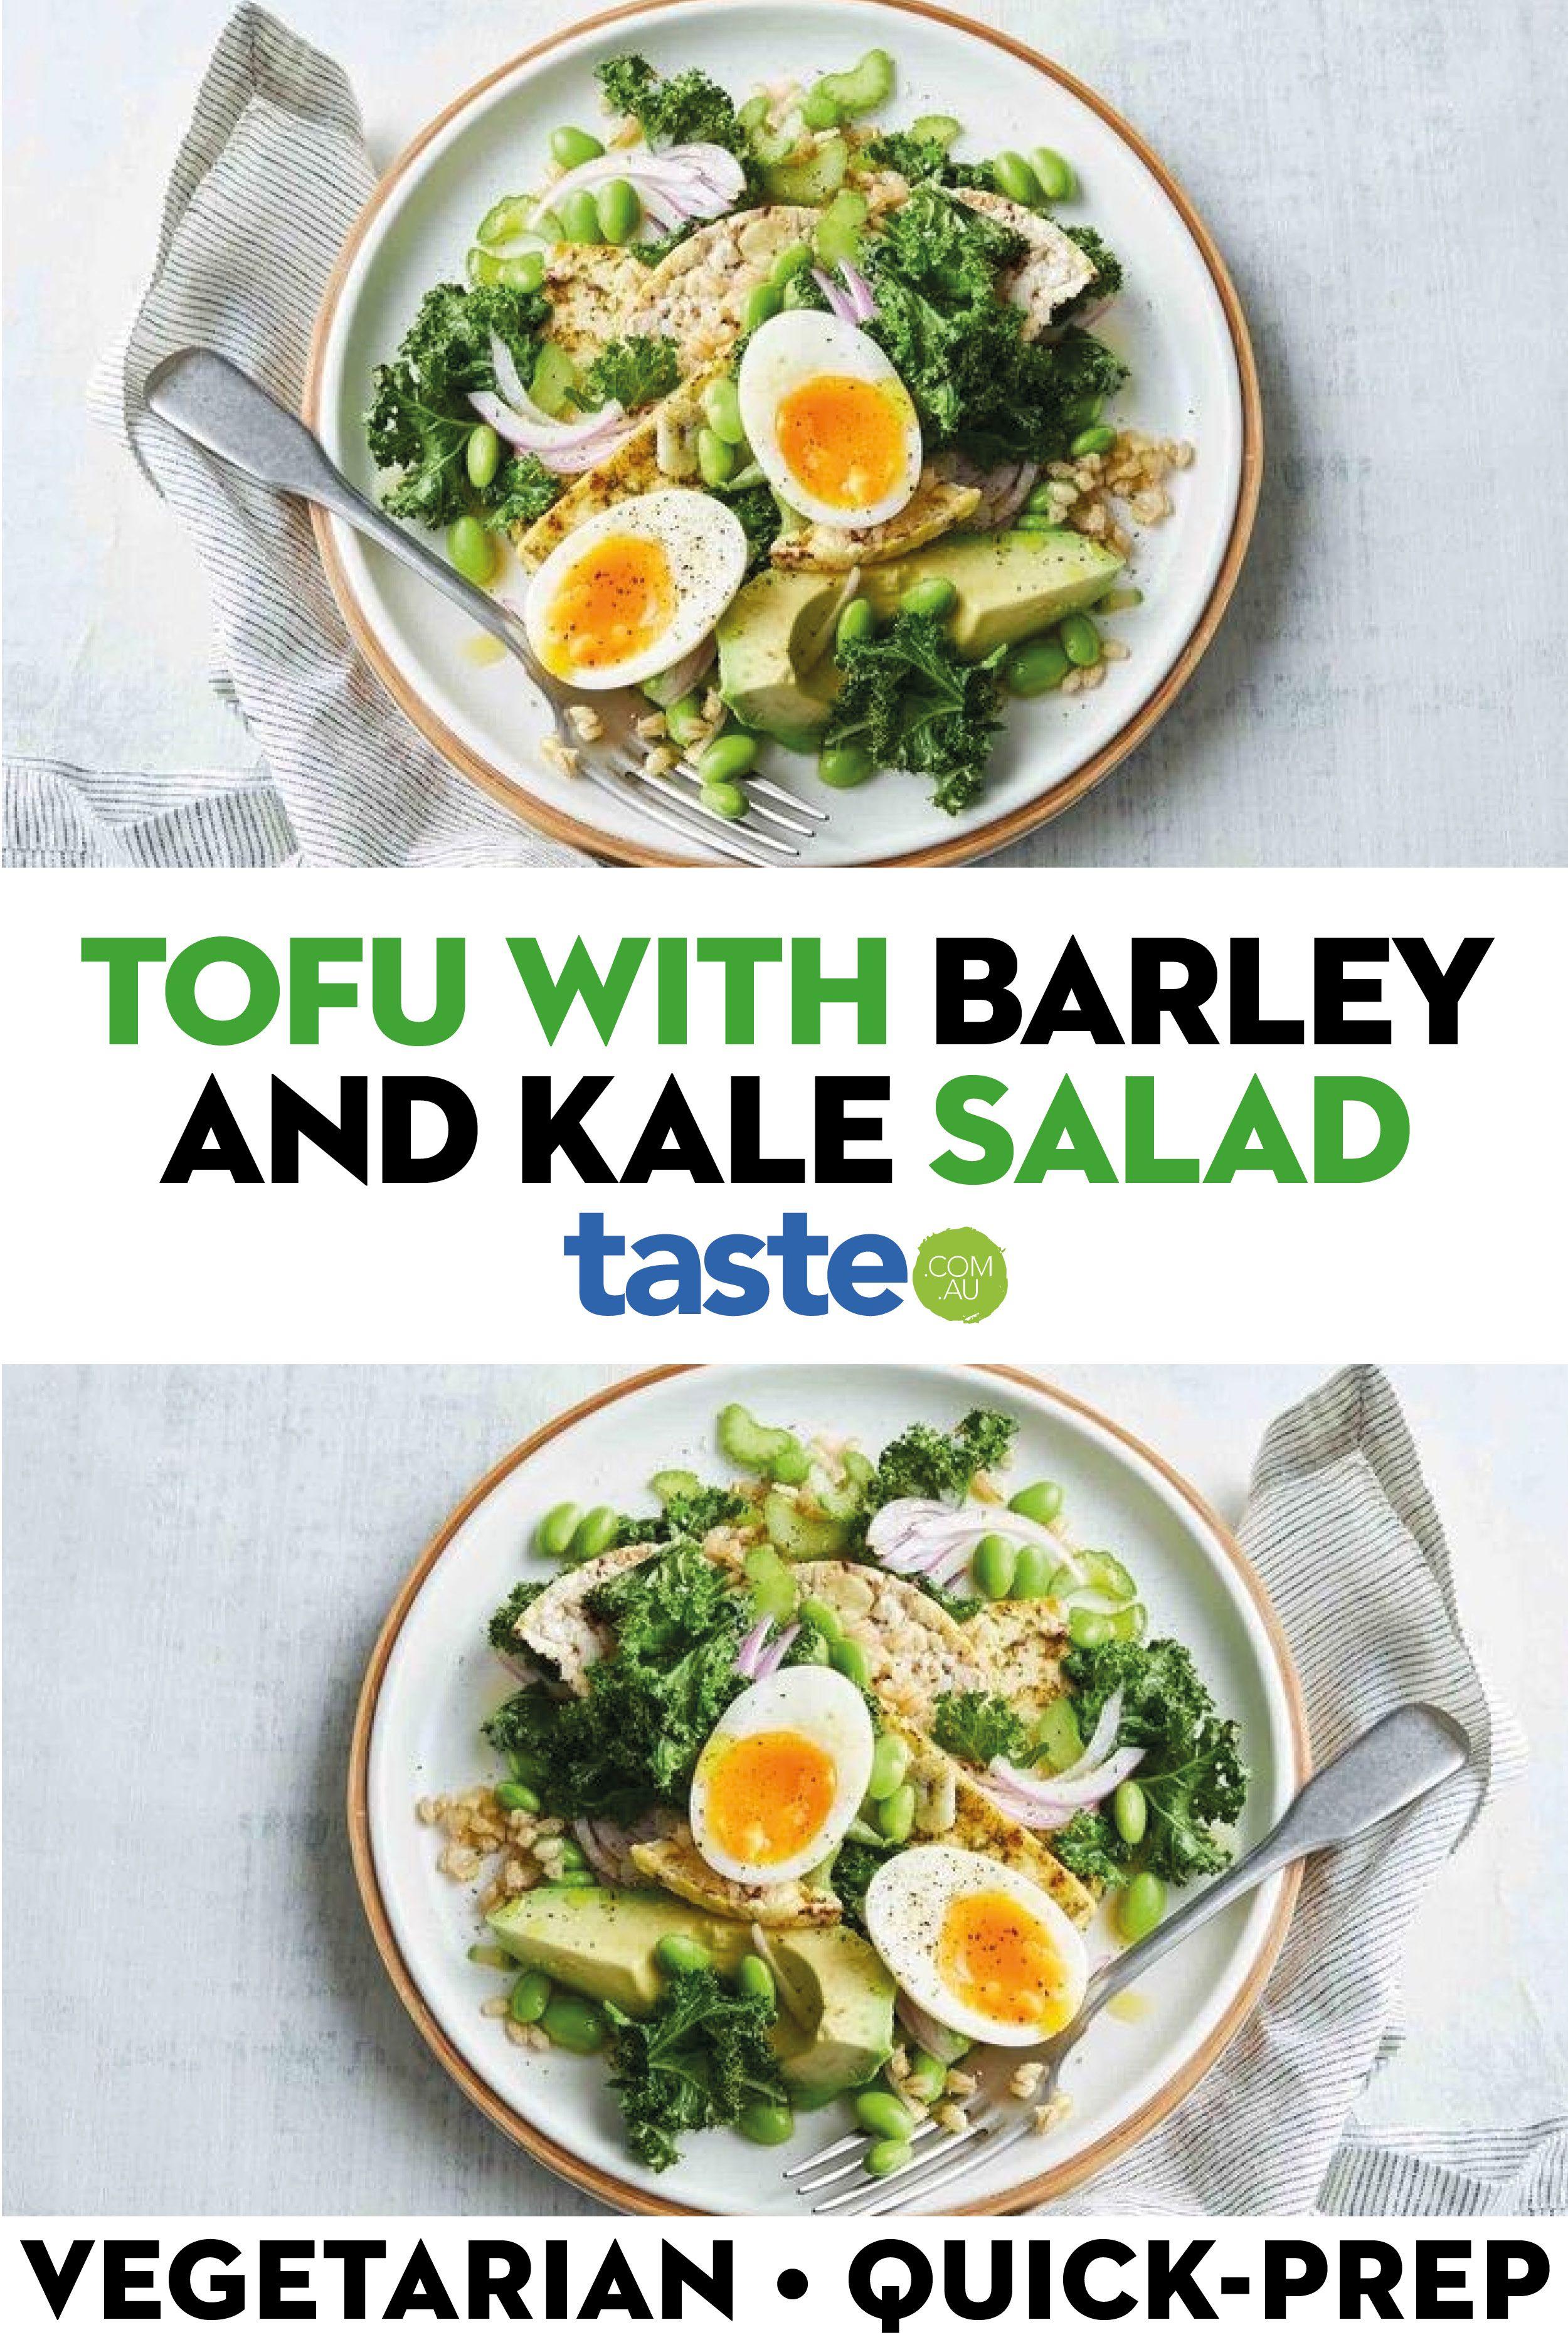 Lemon Garlic Tofu With Barley And Kale Salad In 2020 Vegetarian Recipes Easy Salads Kale Salad